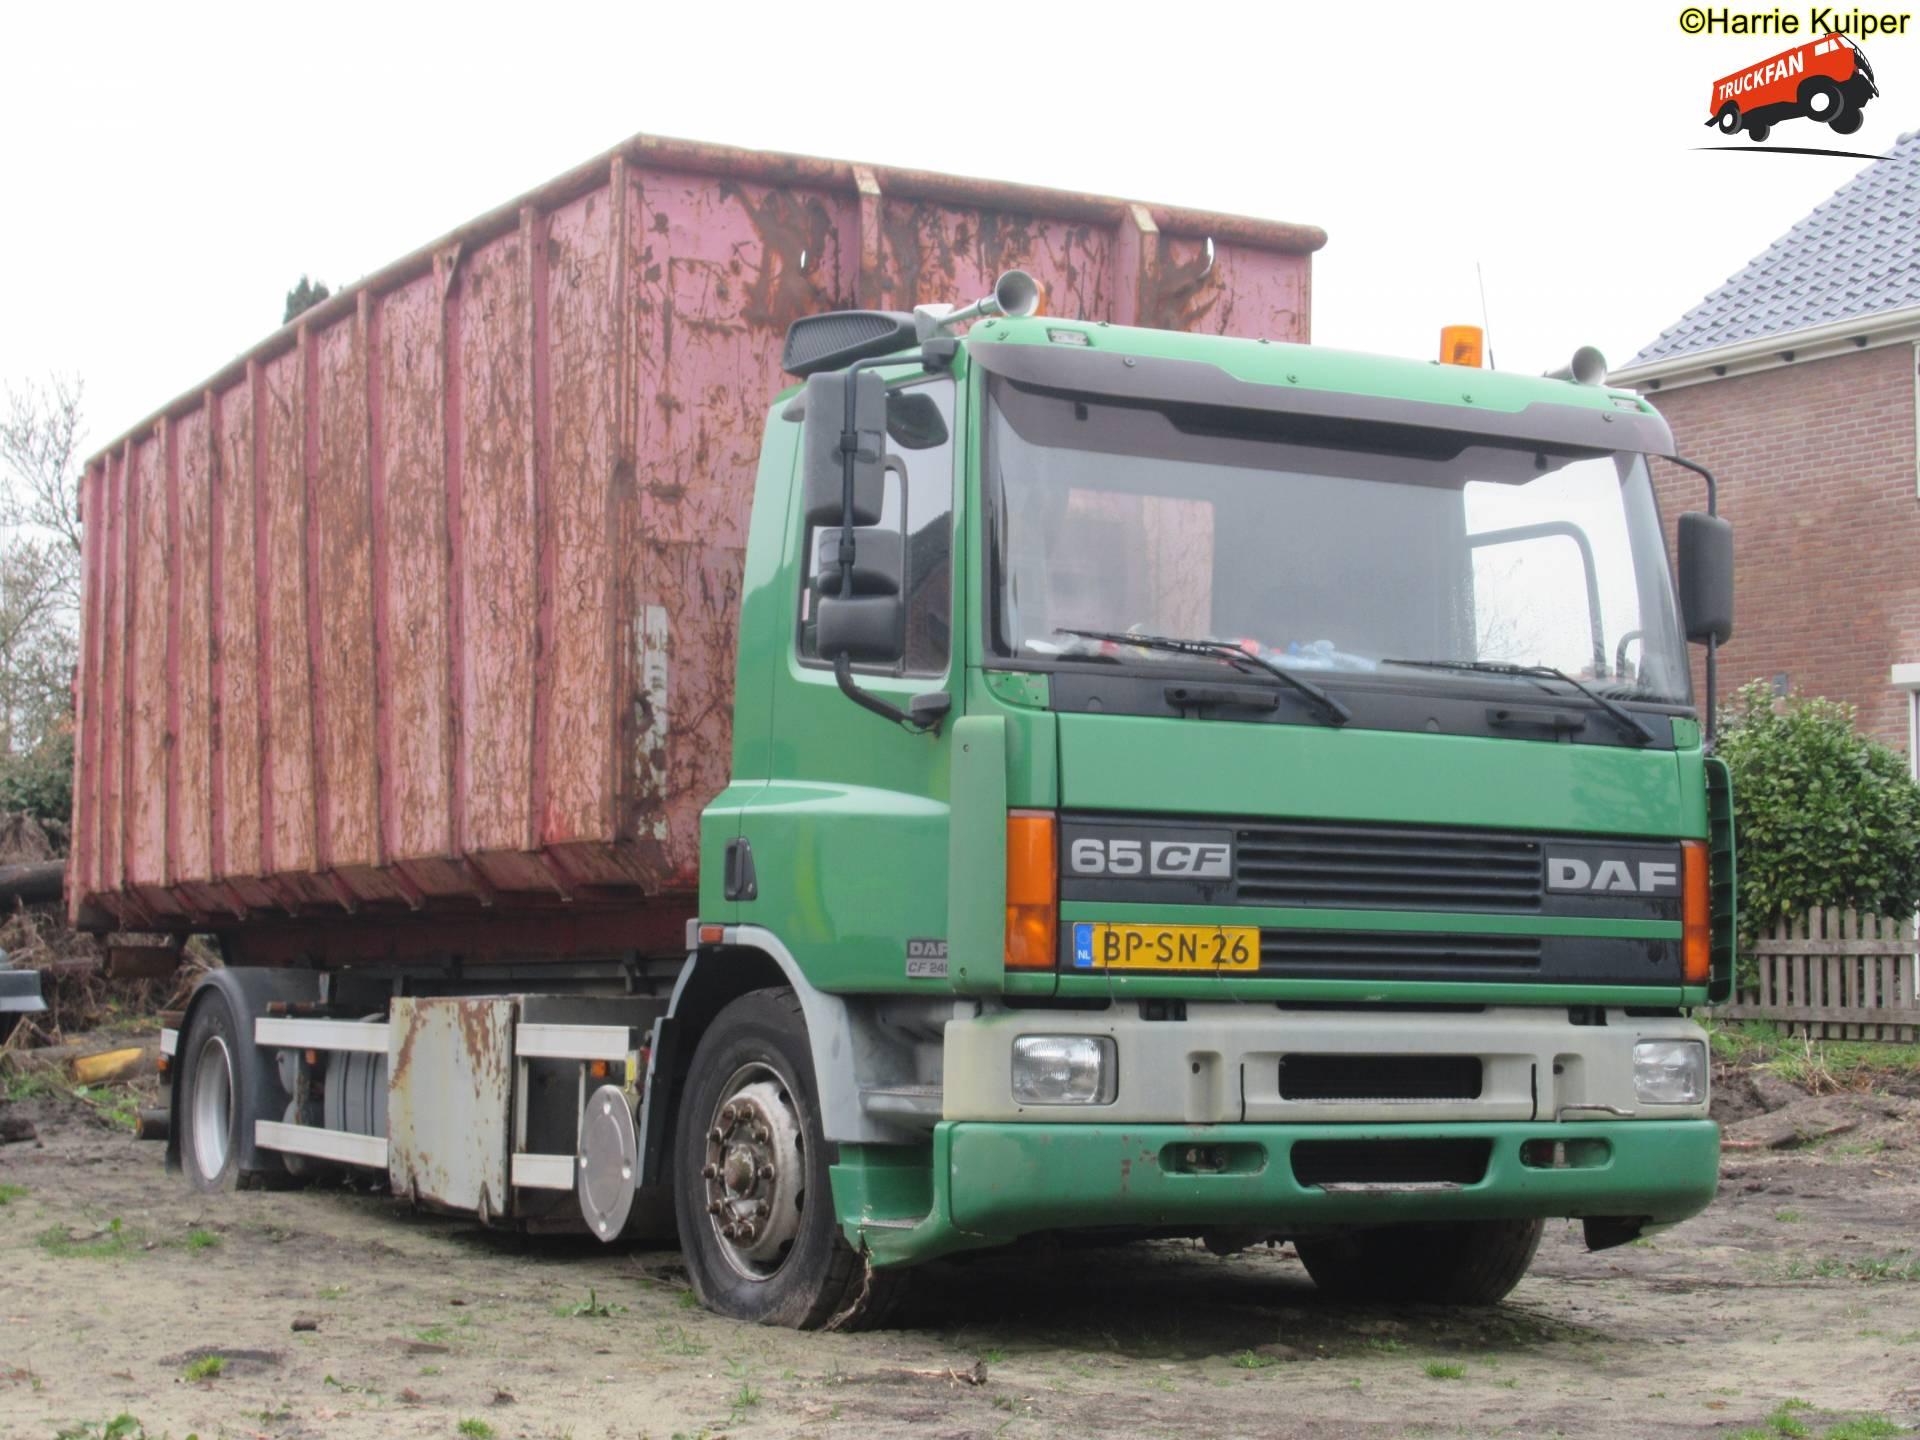 DAF 65CF